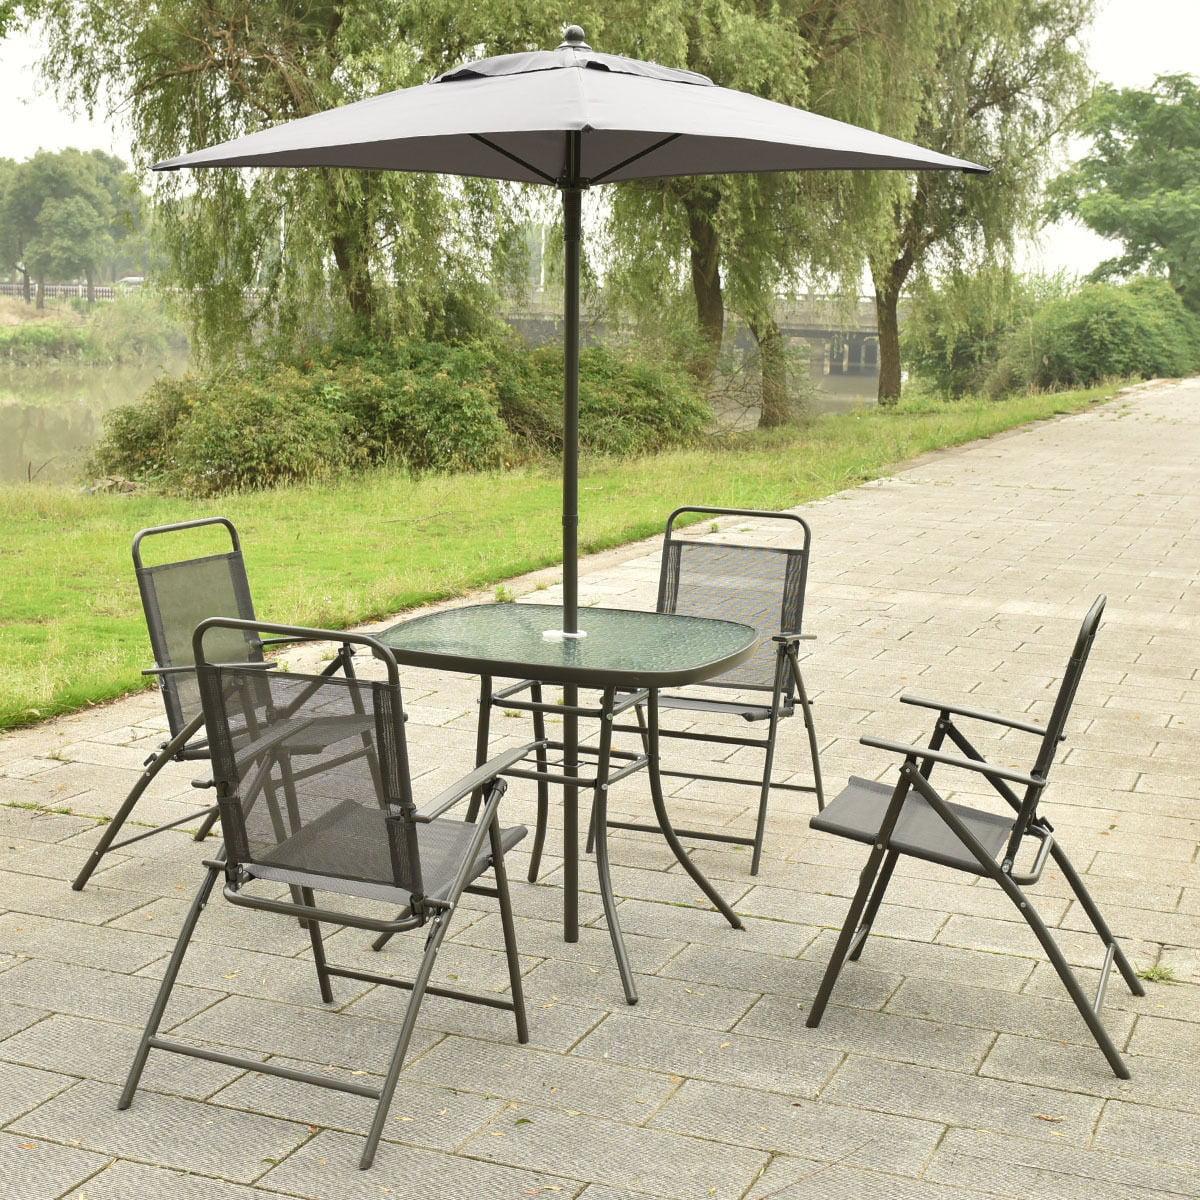 6 Pcs Patio Folding Furniture Set With Umbrella